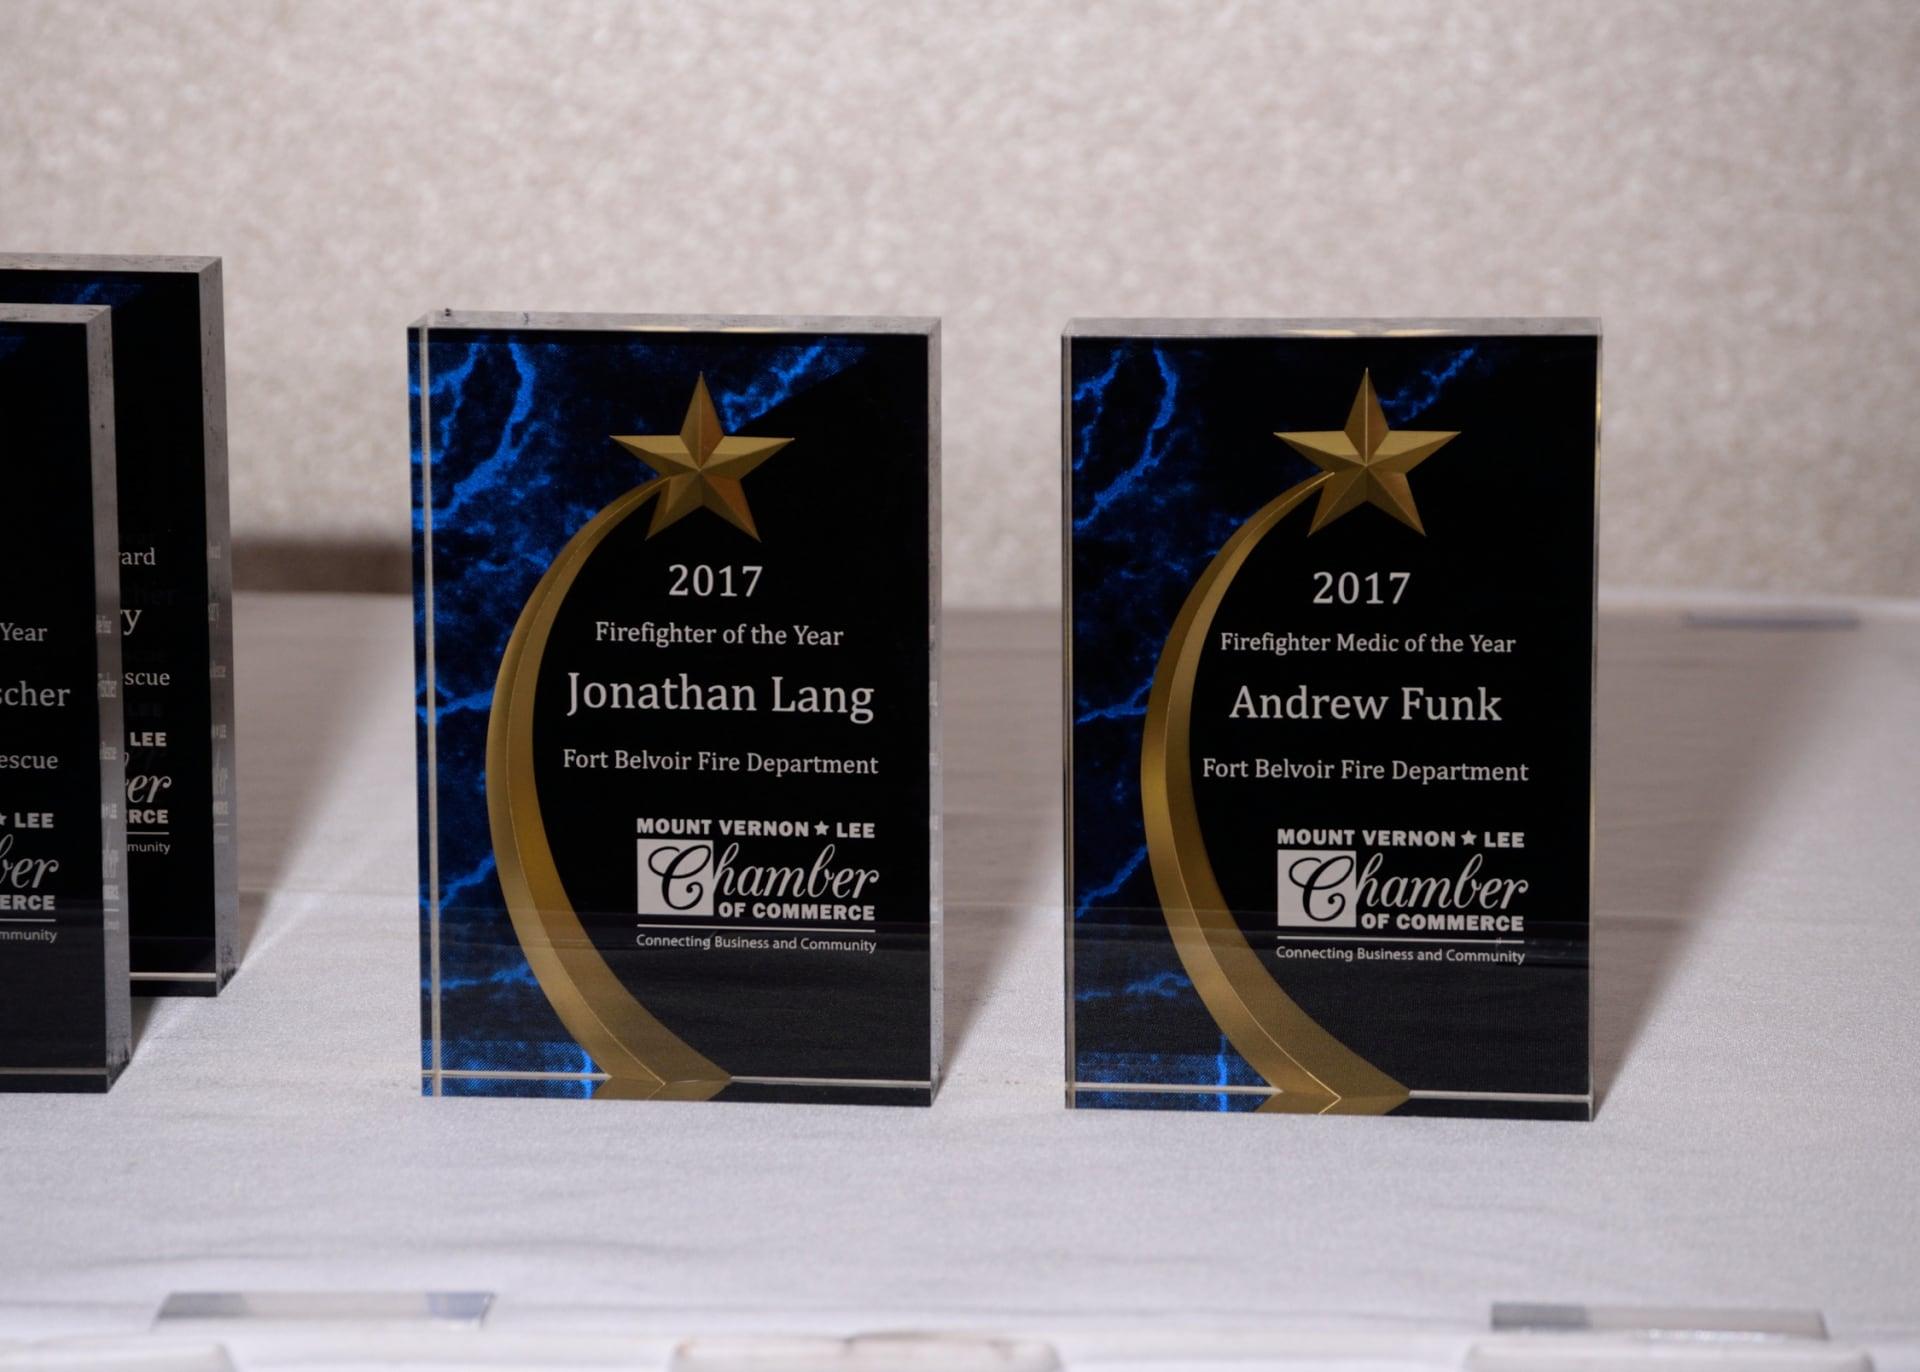 MVLC-Awards17-065.JPG-w1920.jpg